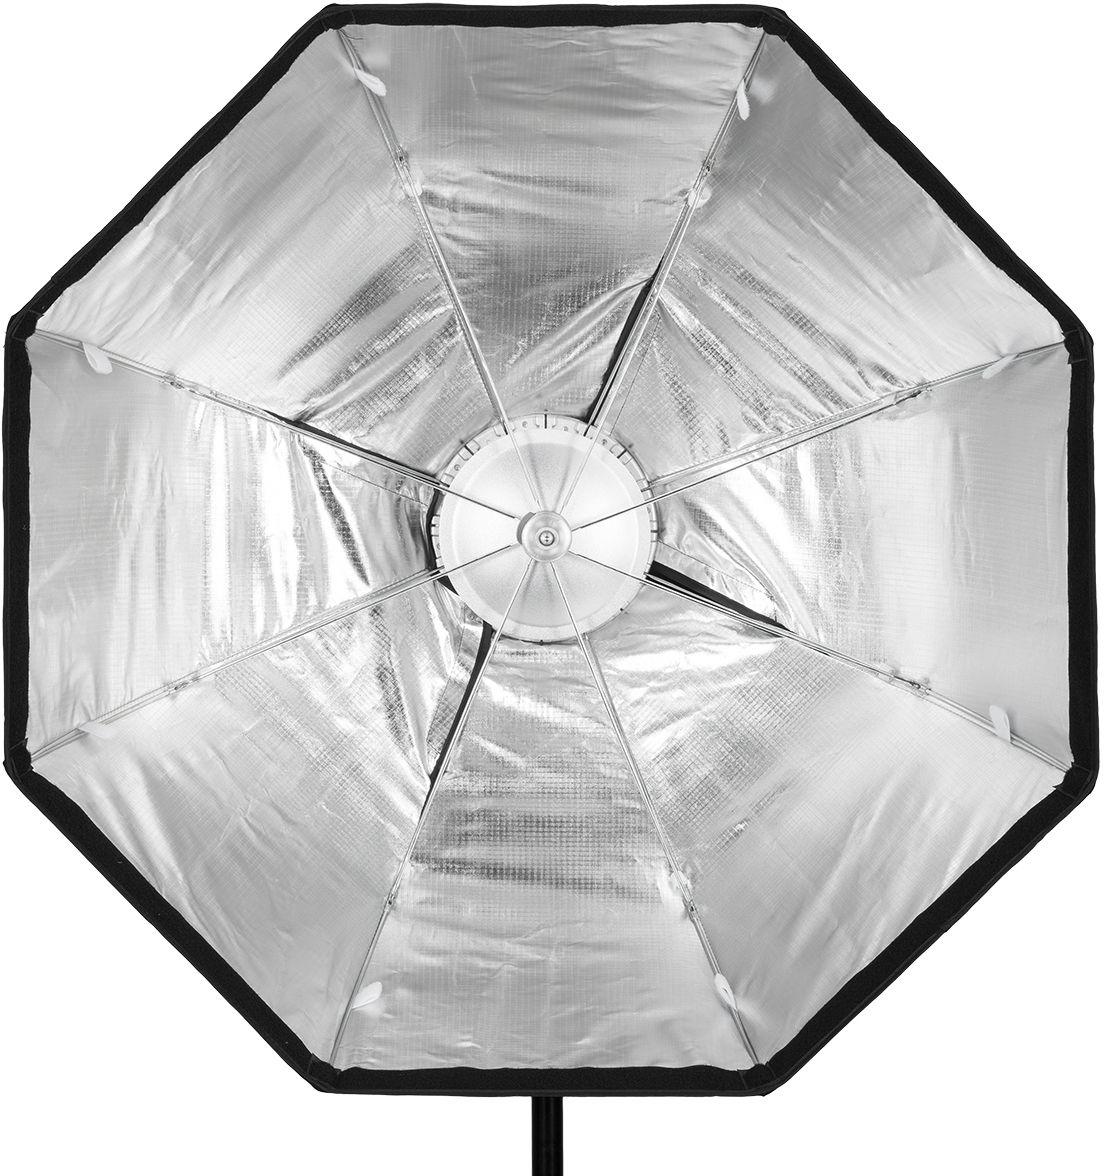 Quadralite Flex Foldable Beauty-Dish - modyfikator światła, softbox, 65cm Quadralite Flex Foldable Beauty-Dish